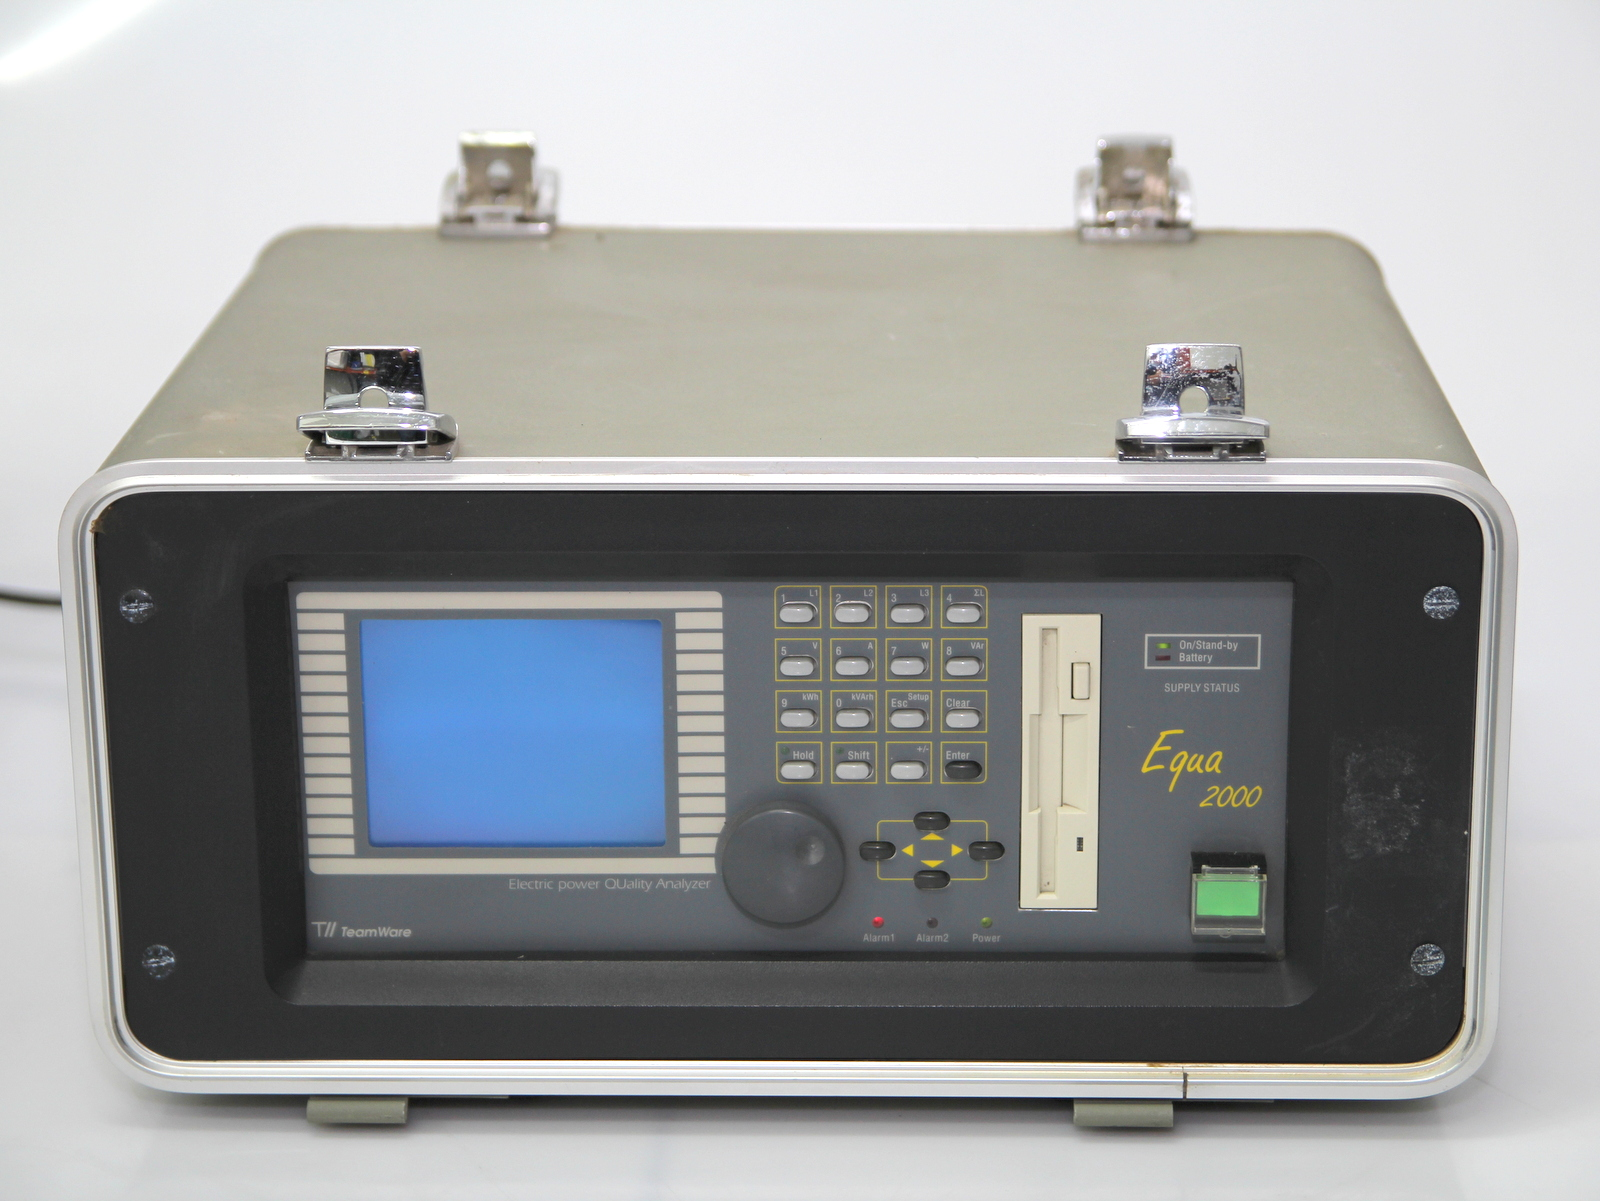 Surplus Electronic Test Equipment : Teamware electric power quality analyzer equa ebay